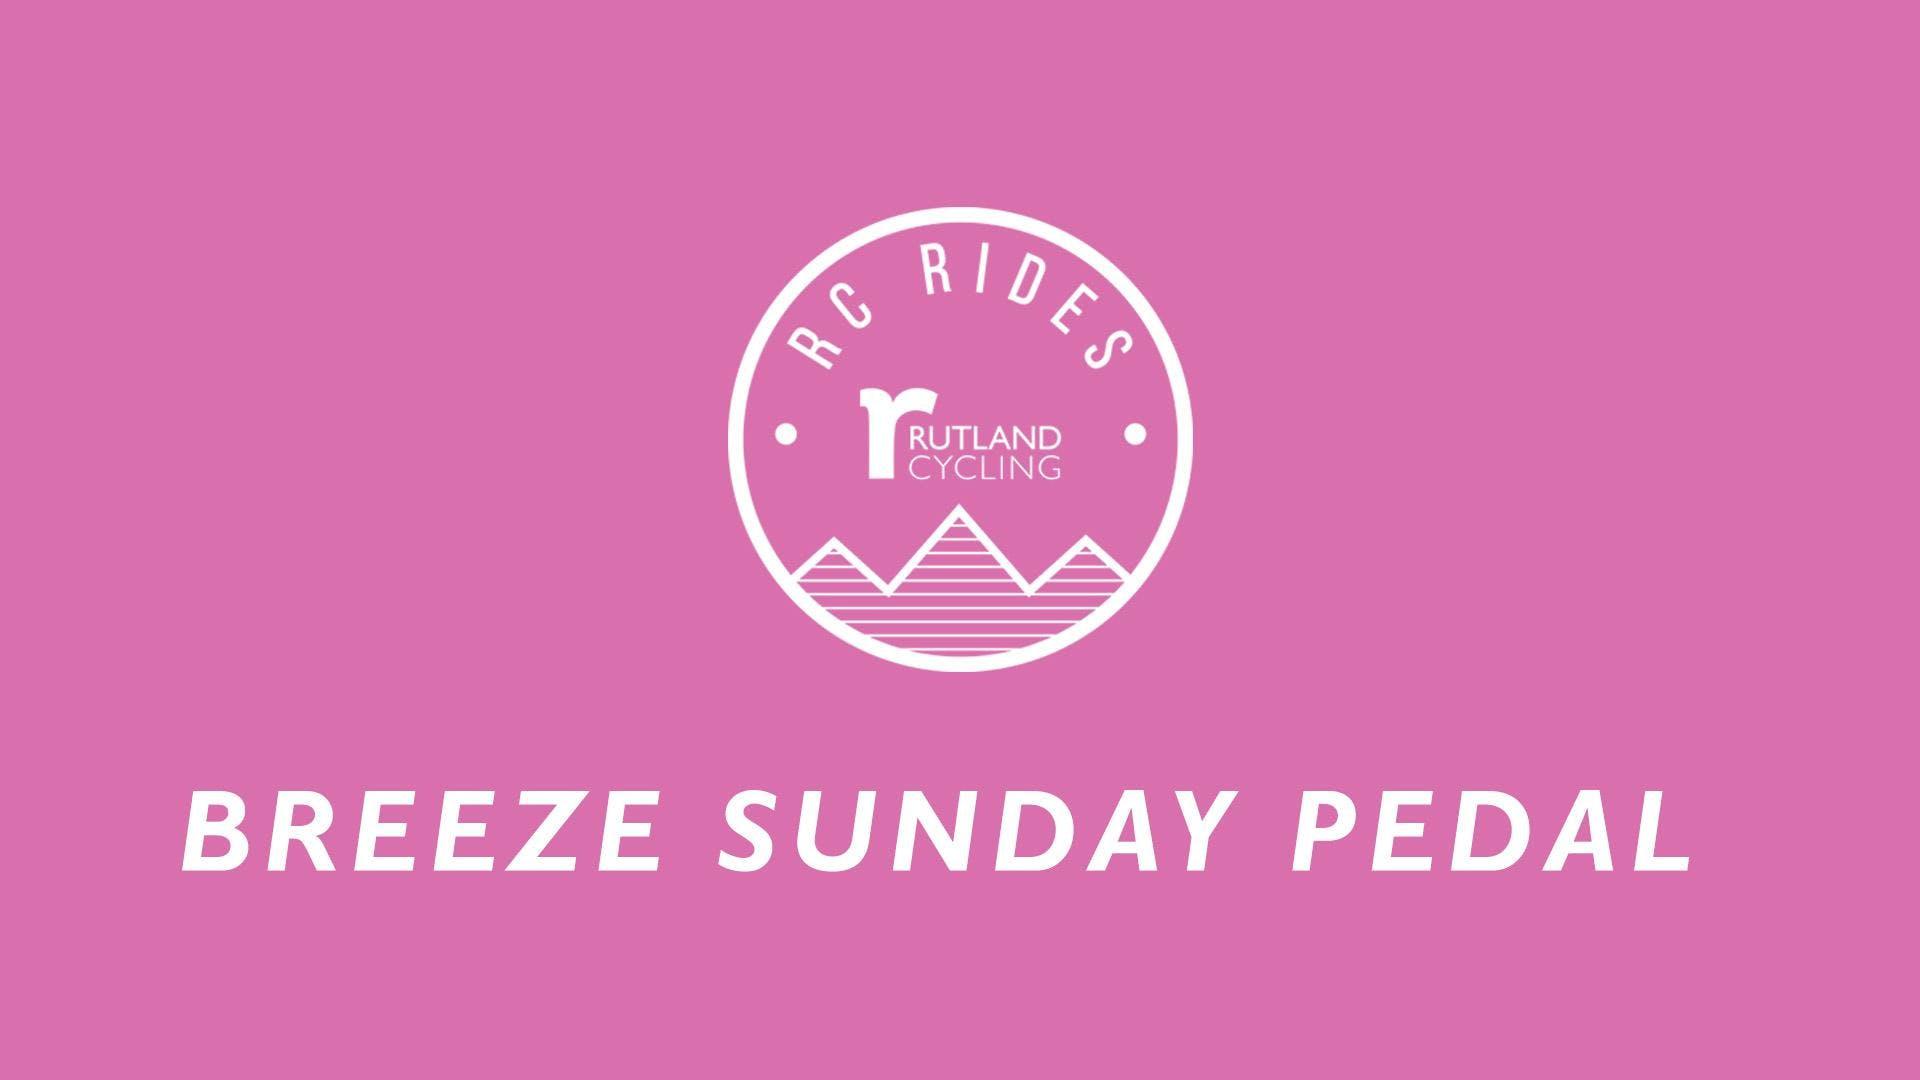 Breeze Sunday Pedal Ride